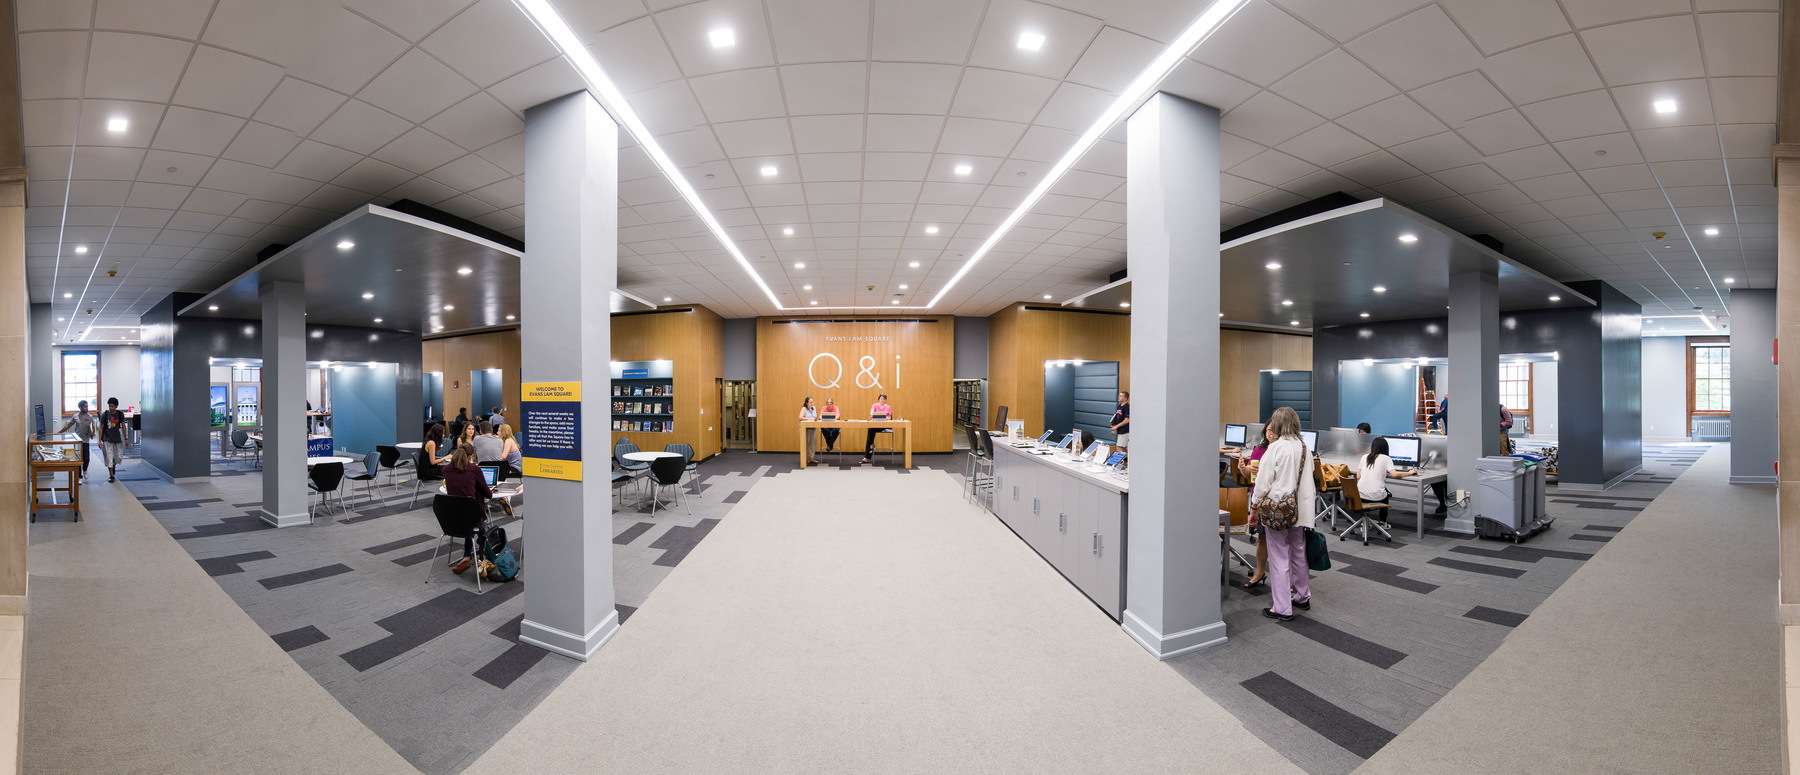 Rush Rhees Library: Evans Lam Square